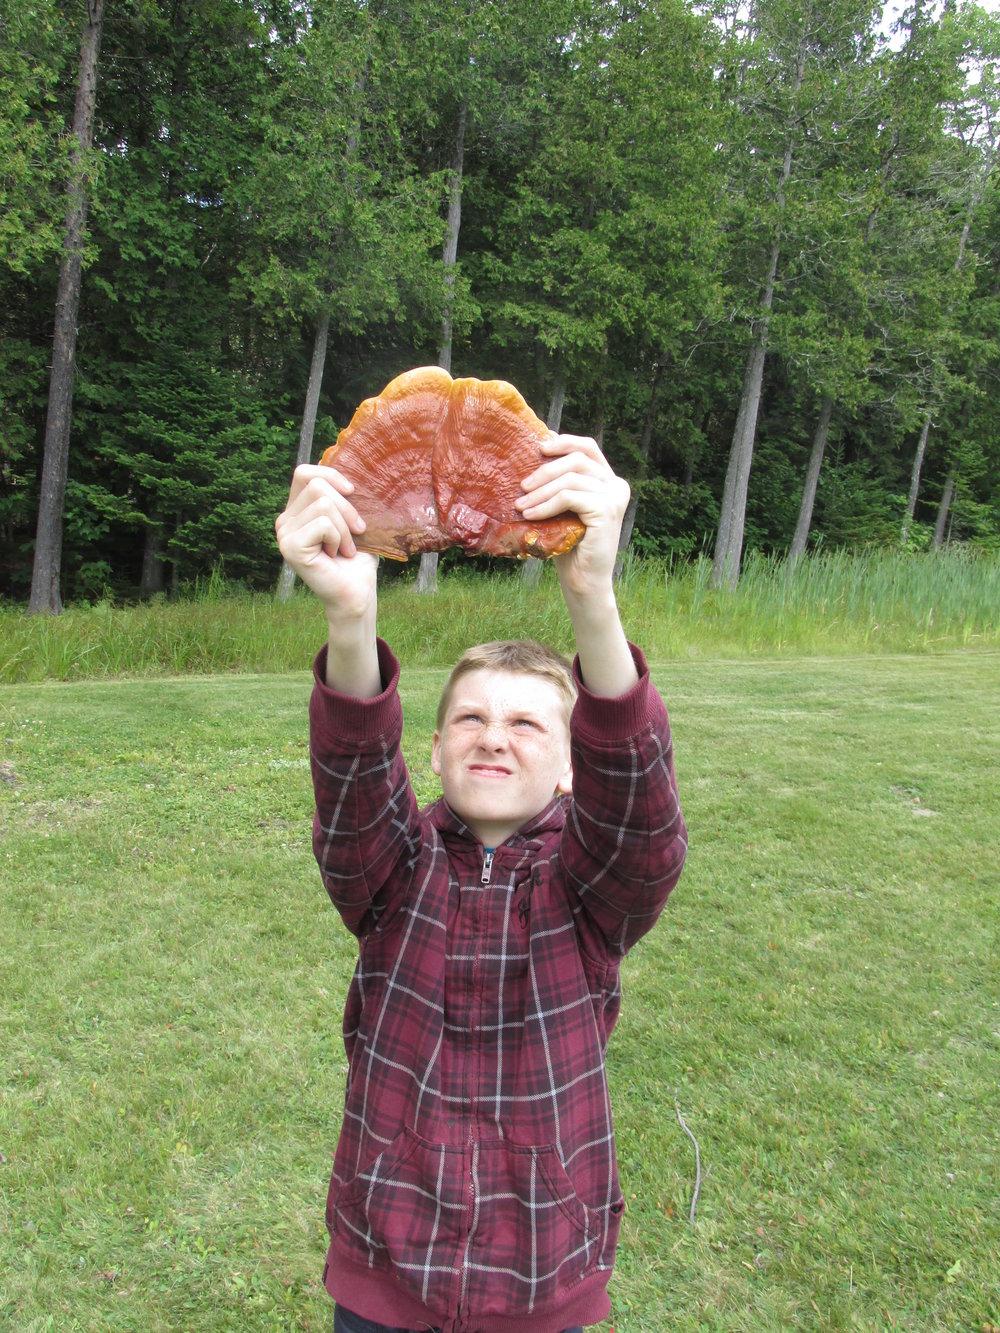 Mighty mushroom